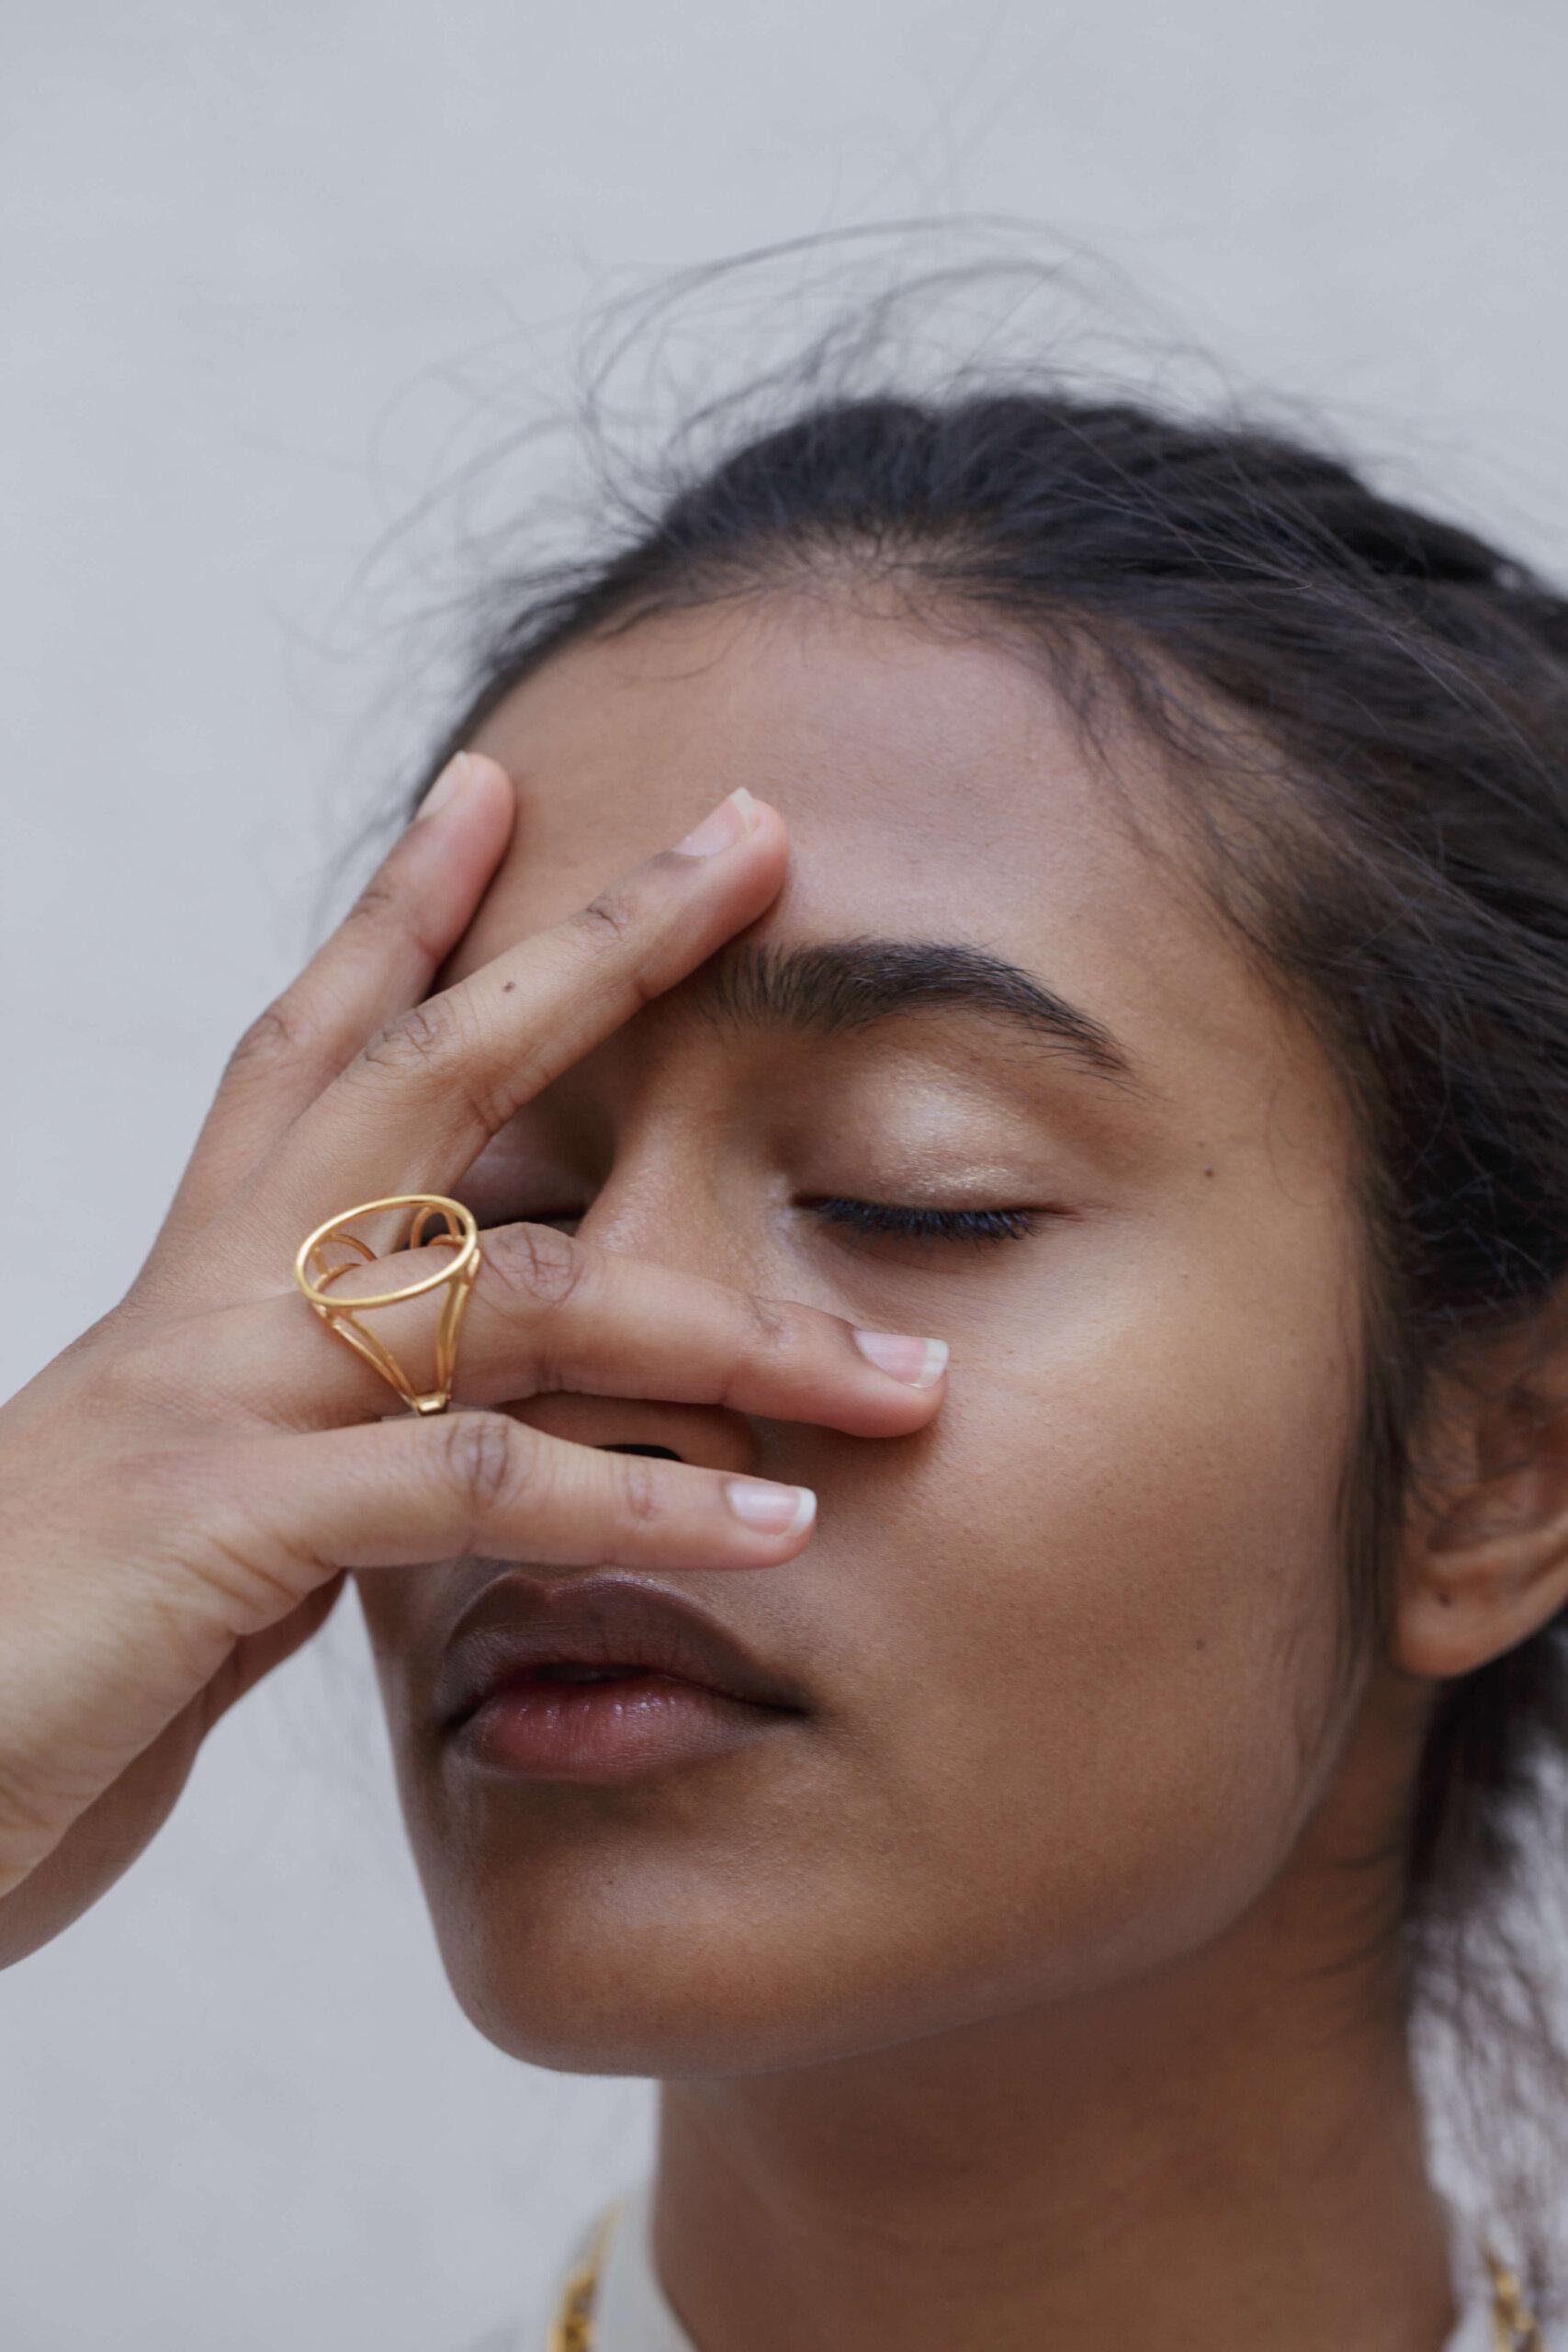 The-empty-signet-ring-by-glenda-lopez-lookbook